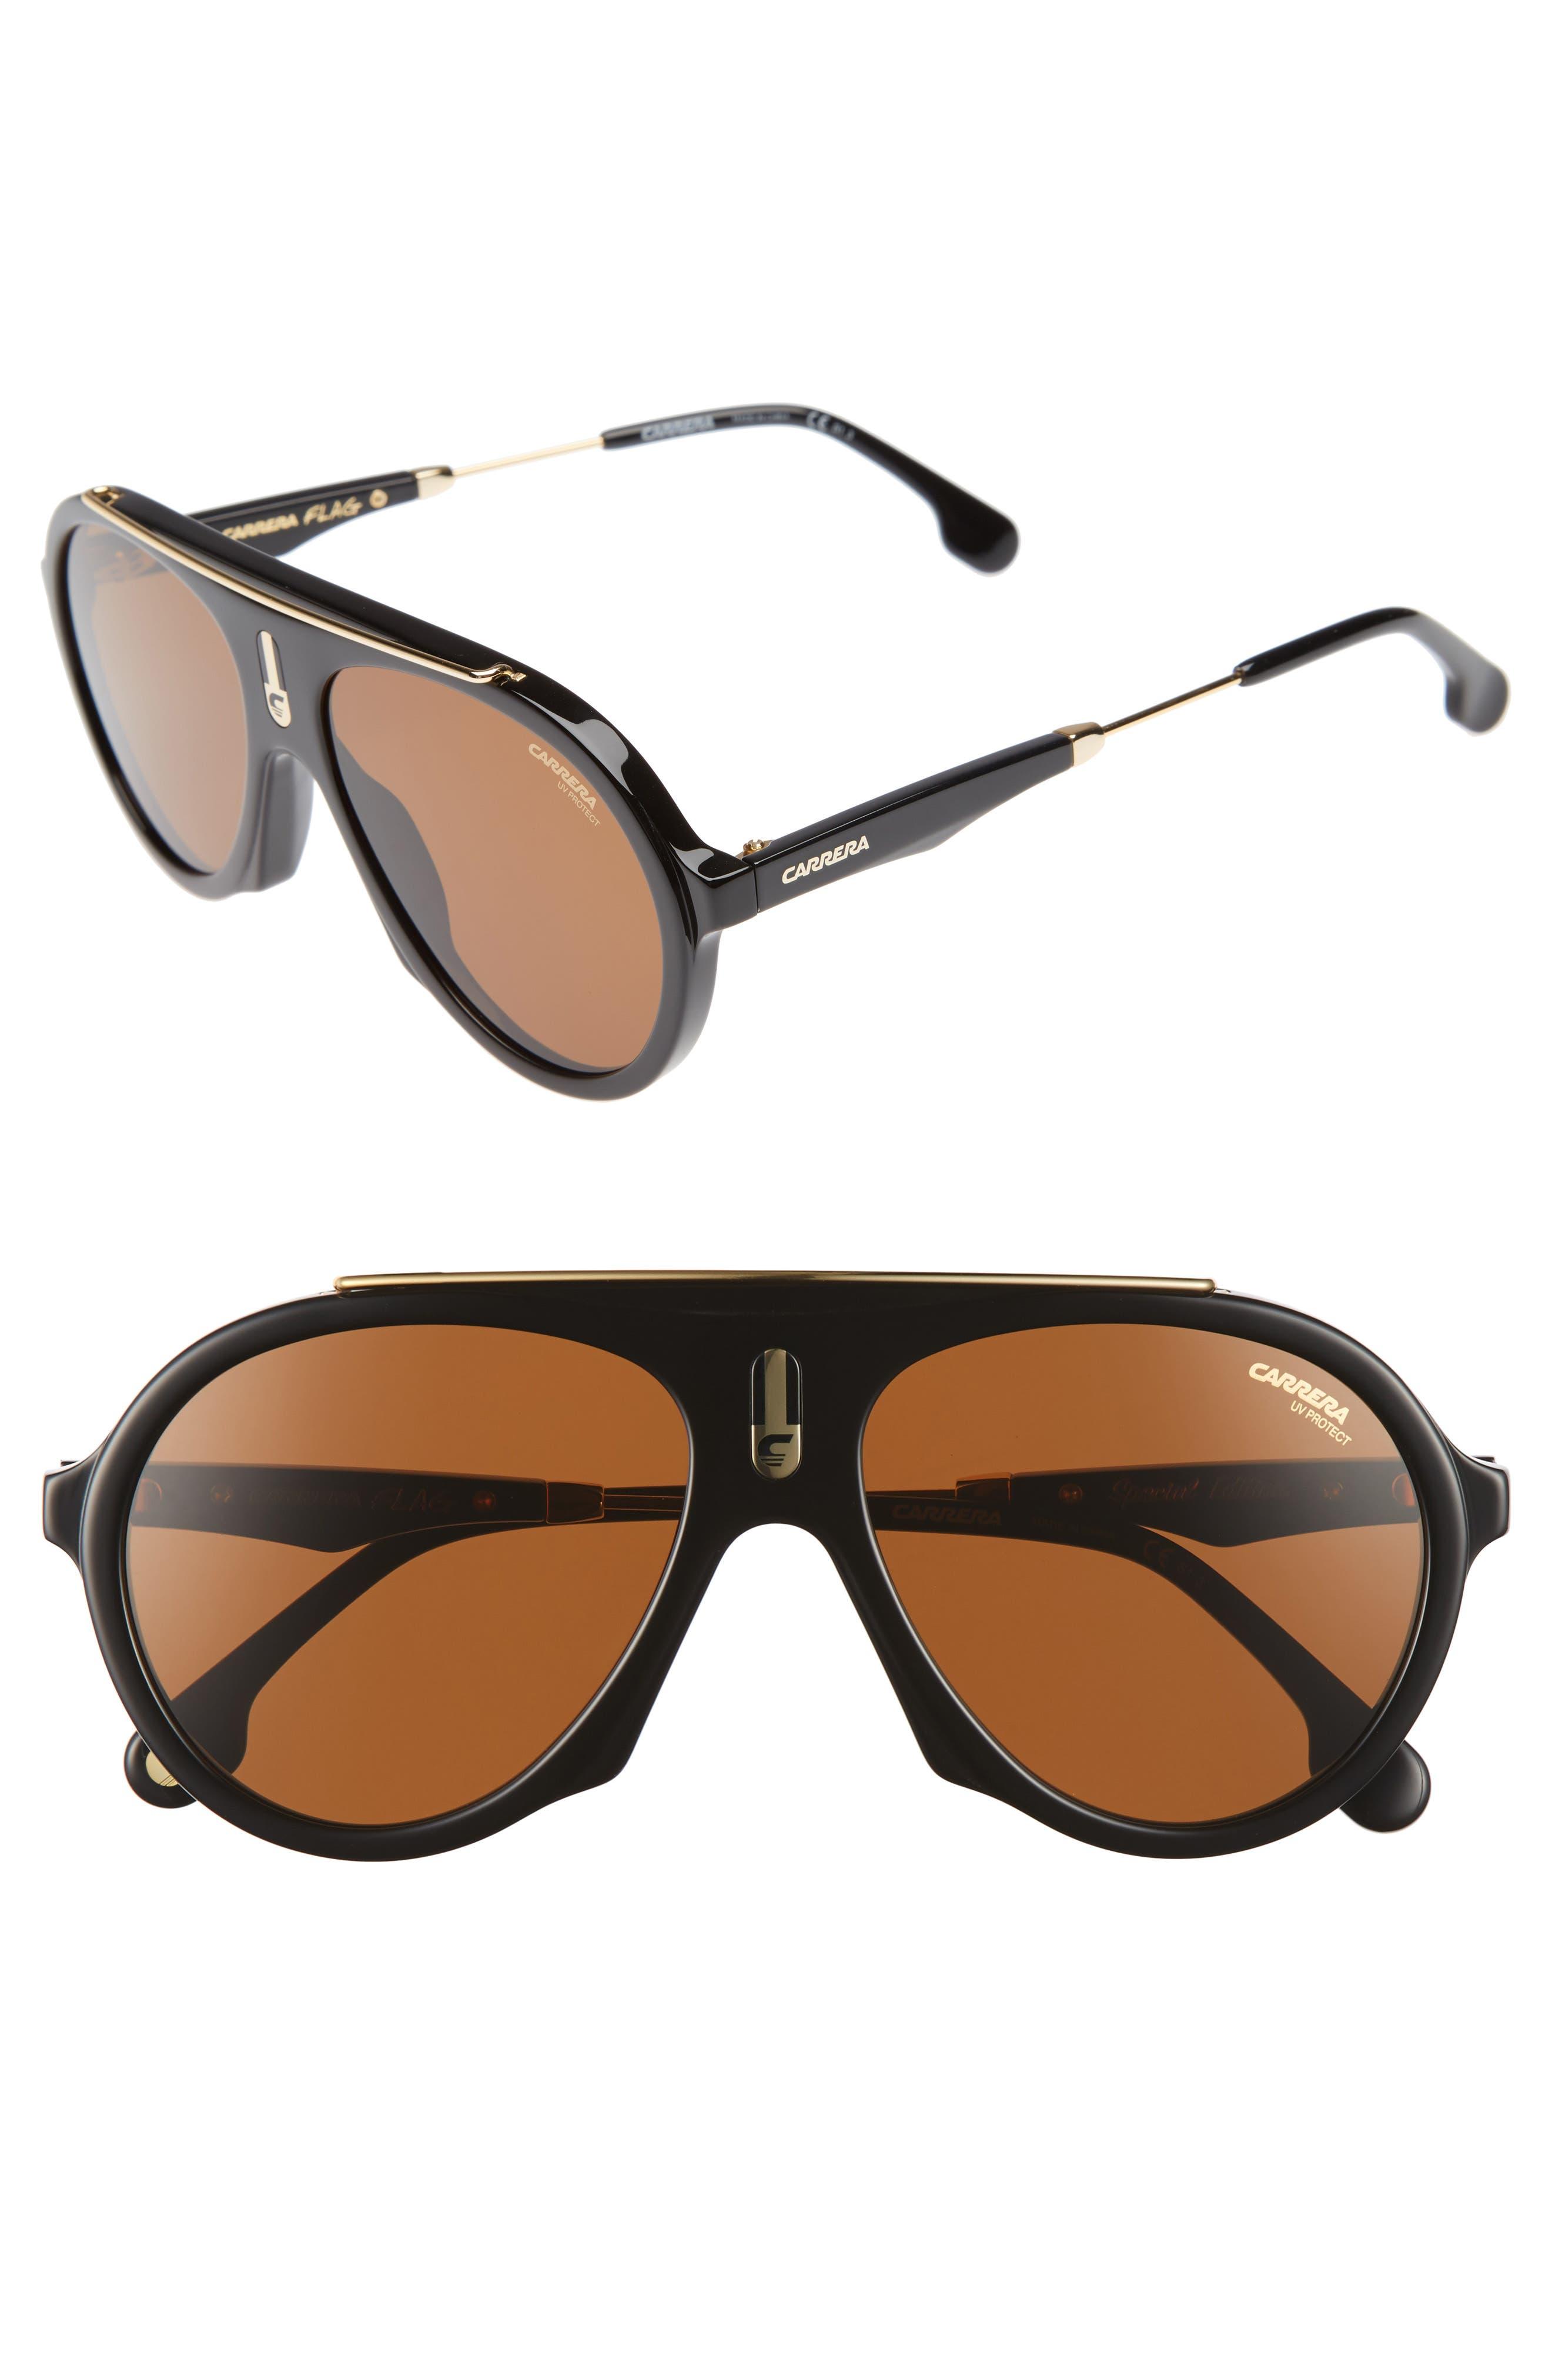 Flags 57mm Sunglasses,                             Main thumbnail 1, color,                             Black